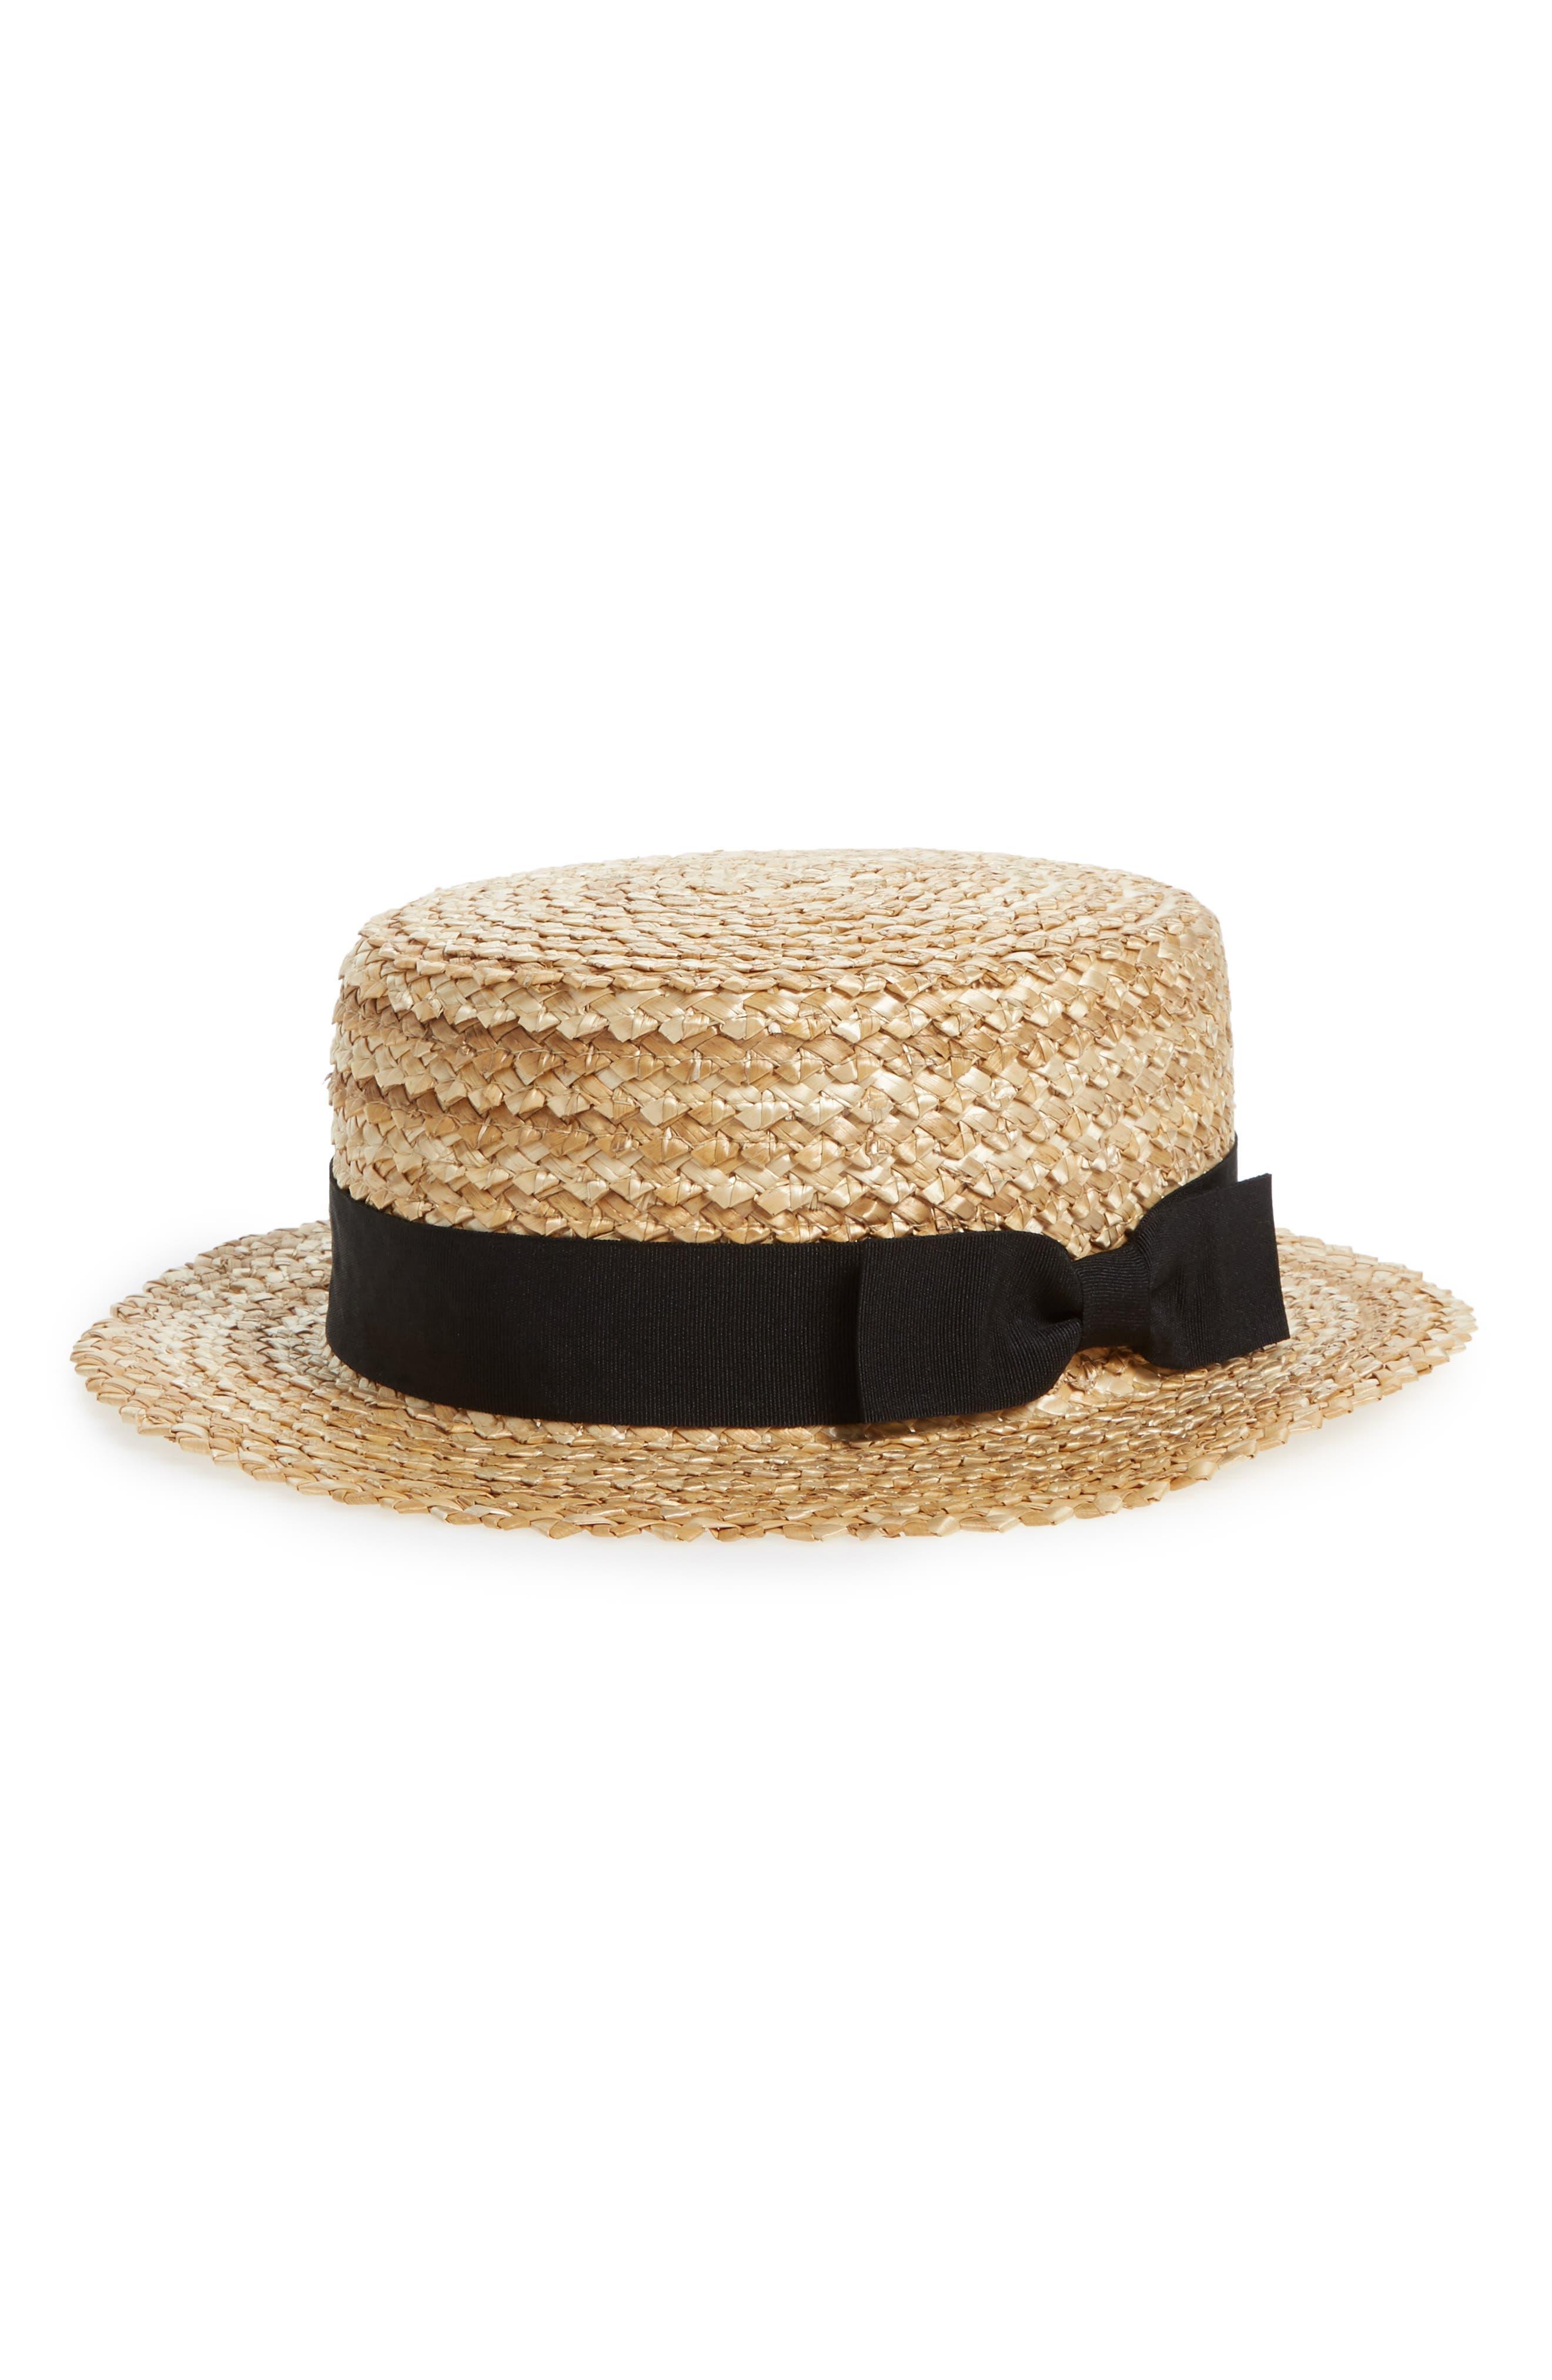 Main Image - Kitsch Ribbon Straw Boater Hat